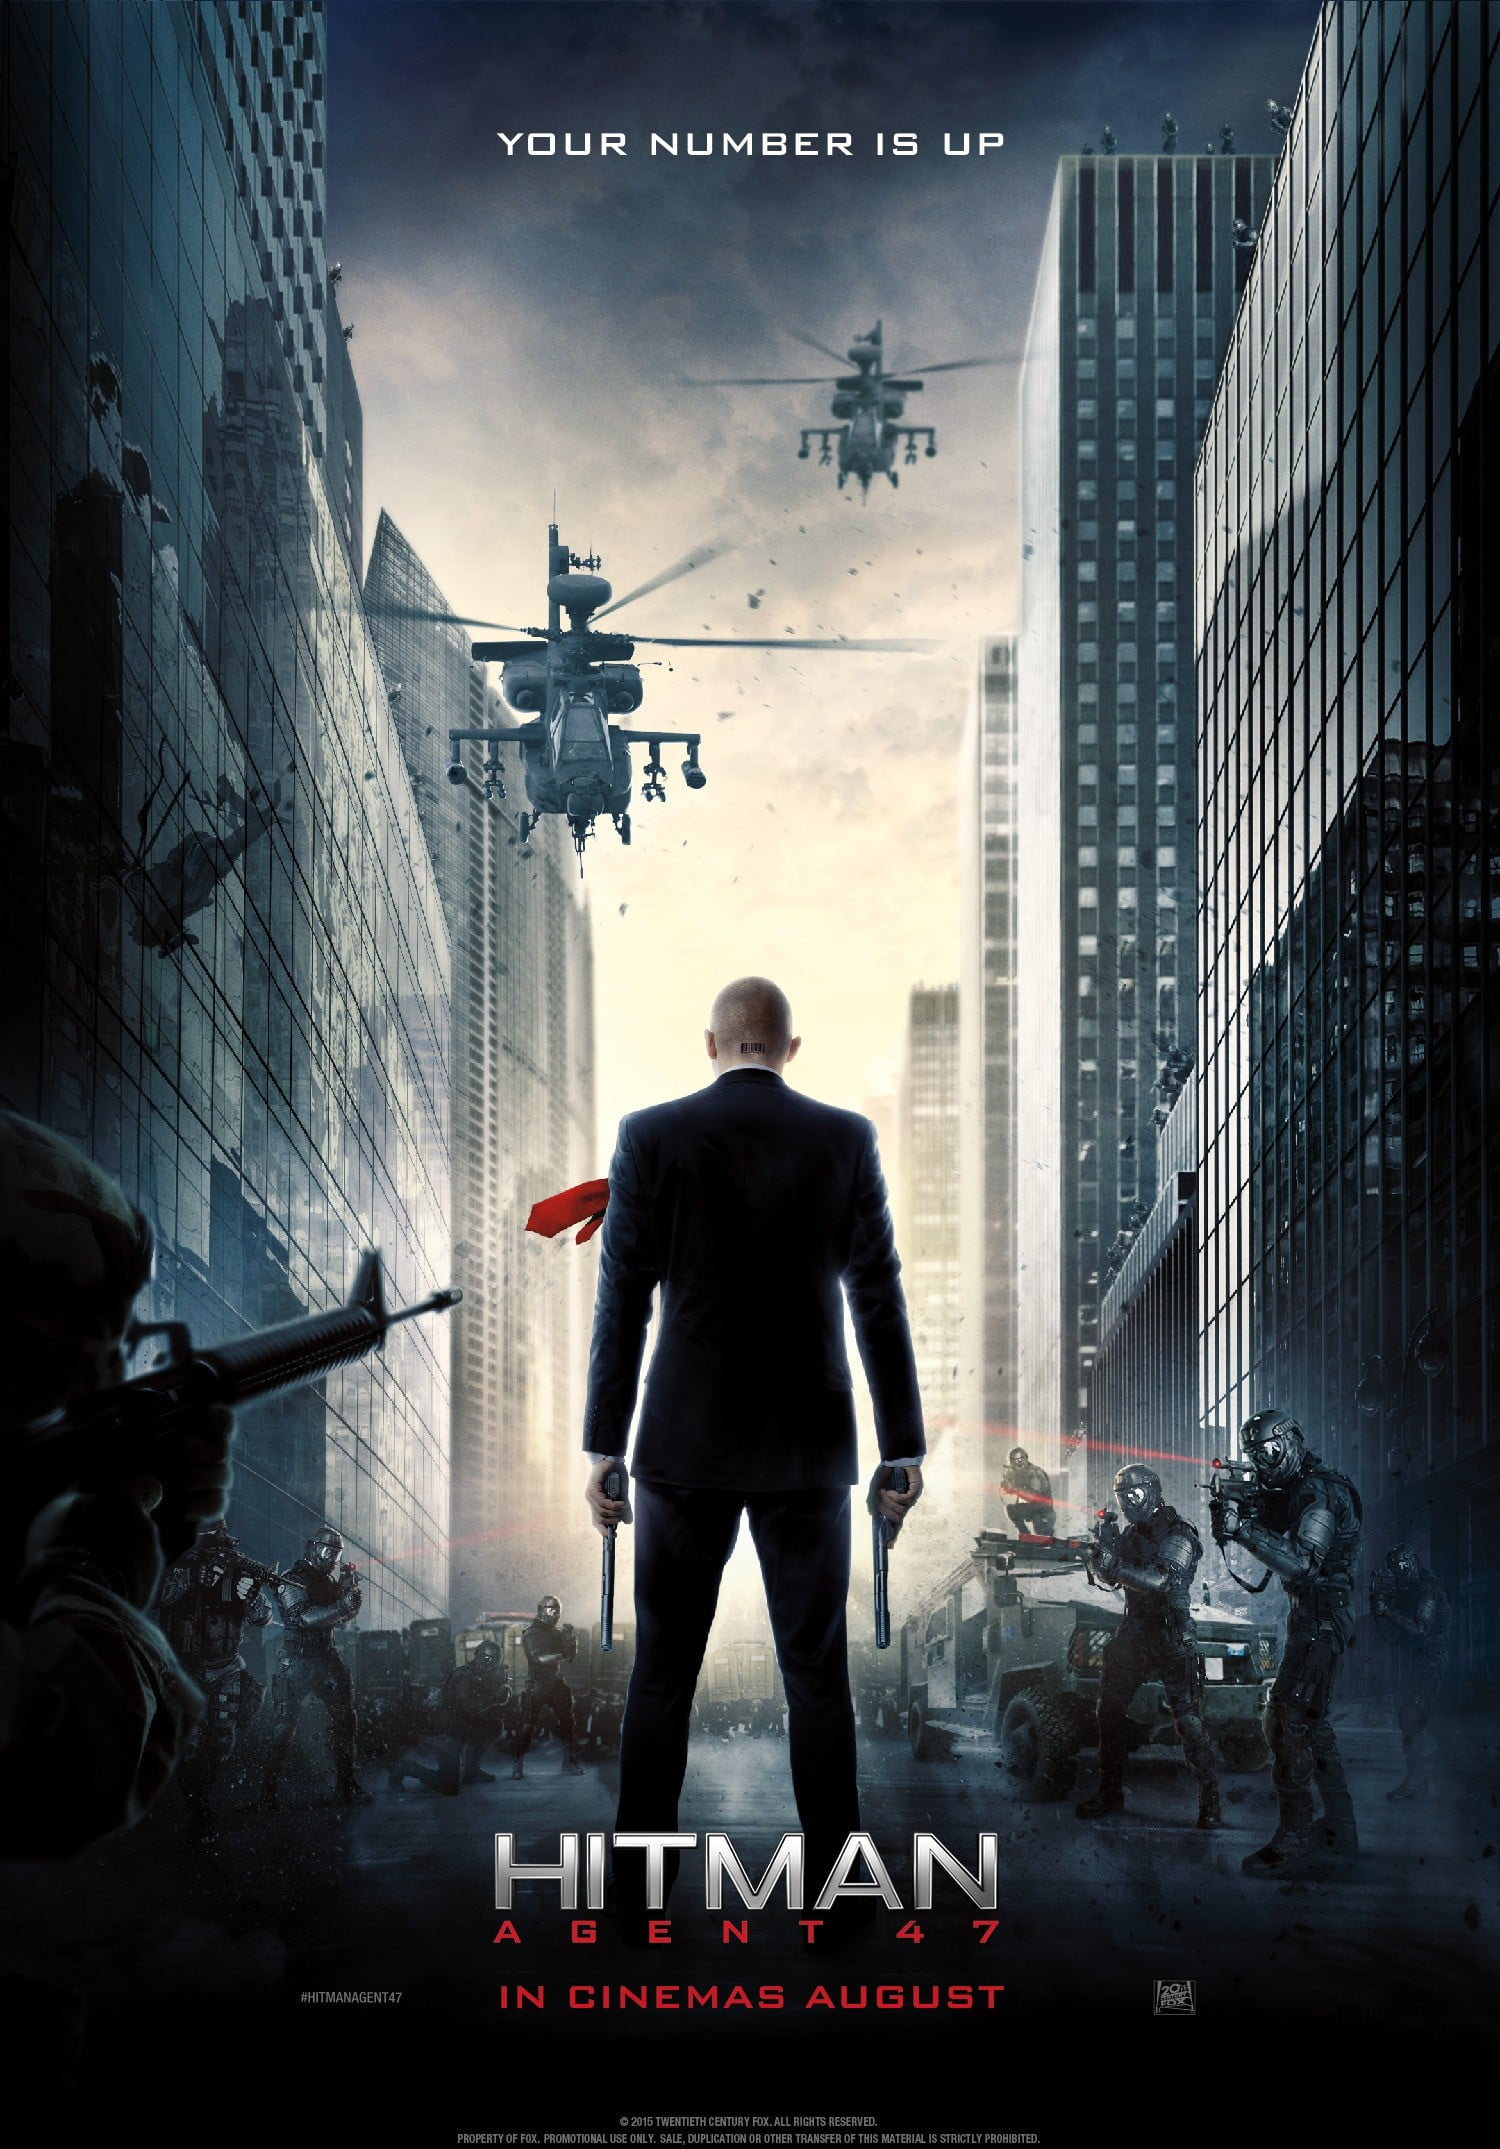 Nuevo poster hitman agent 47